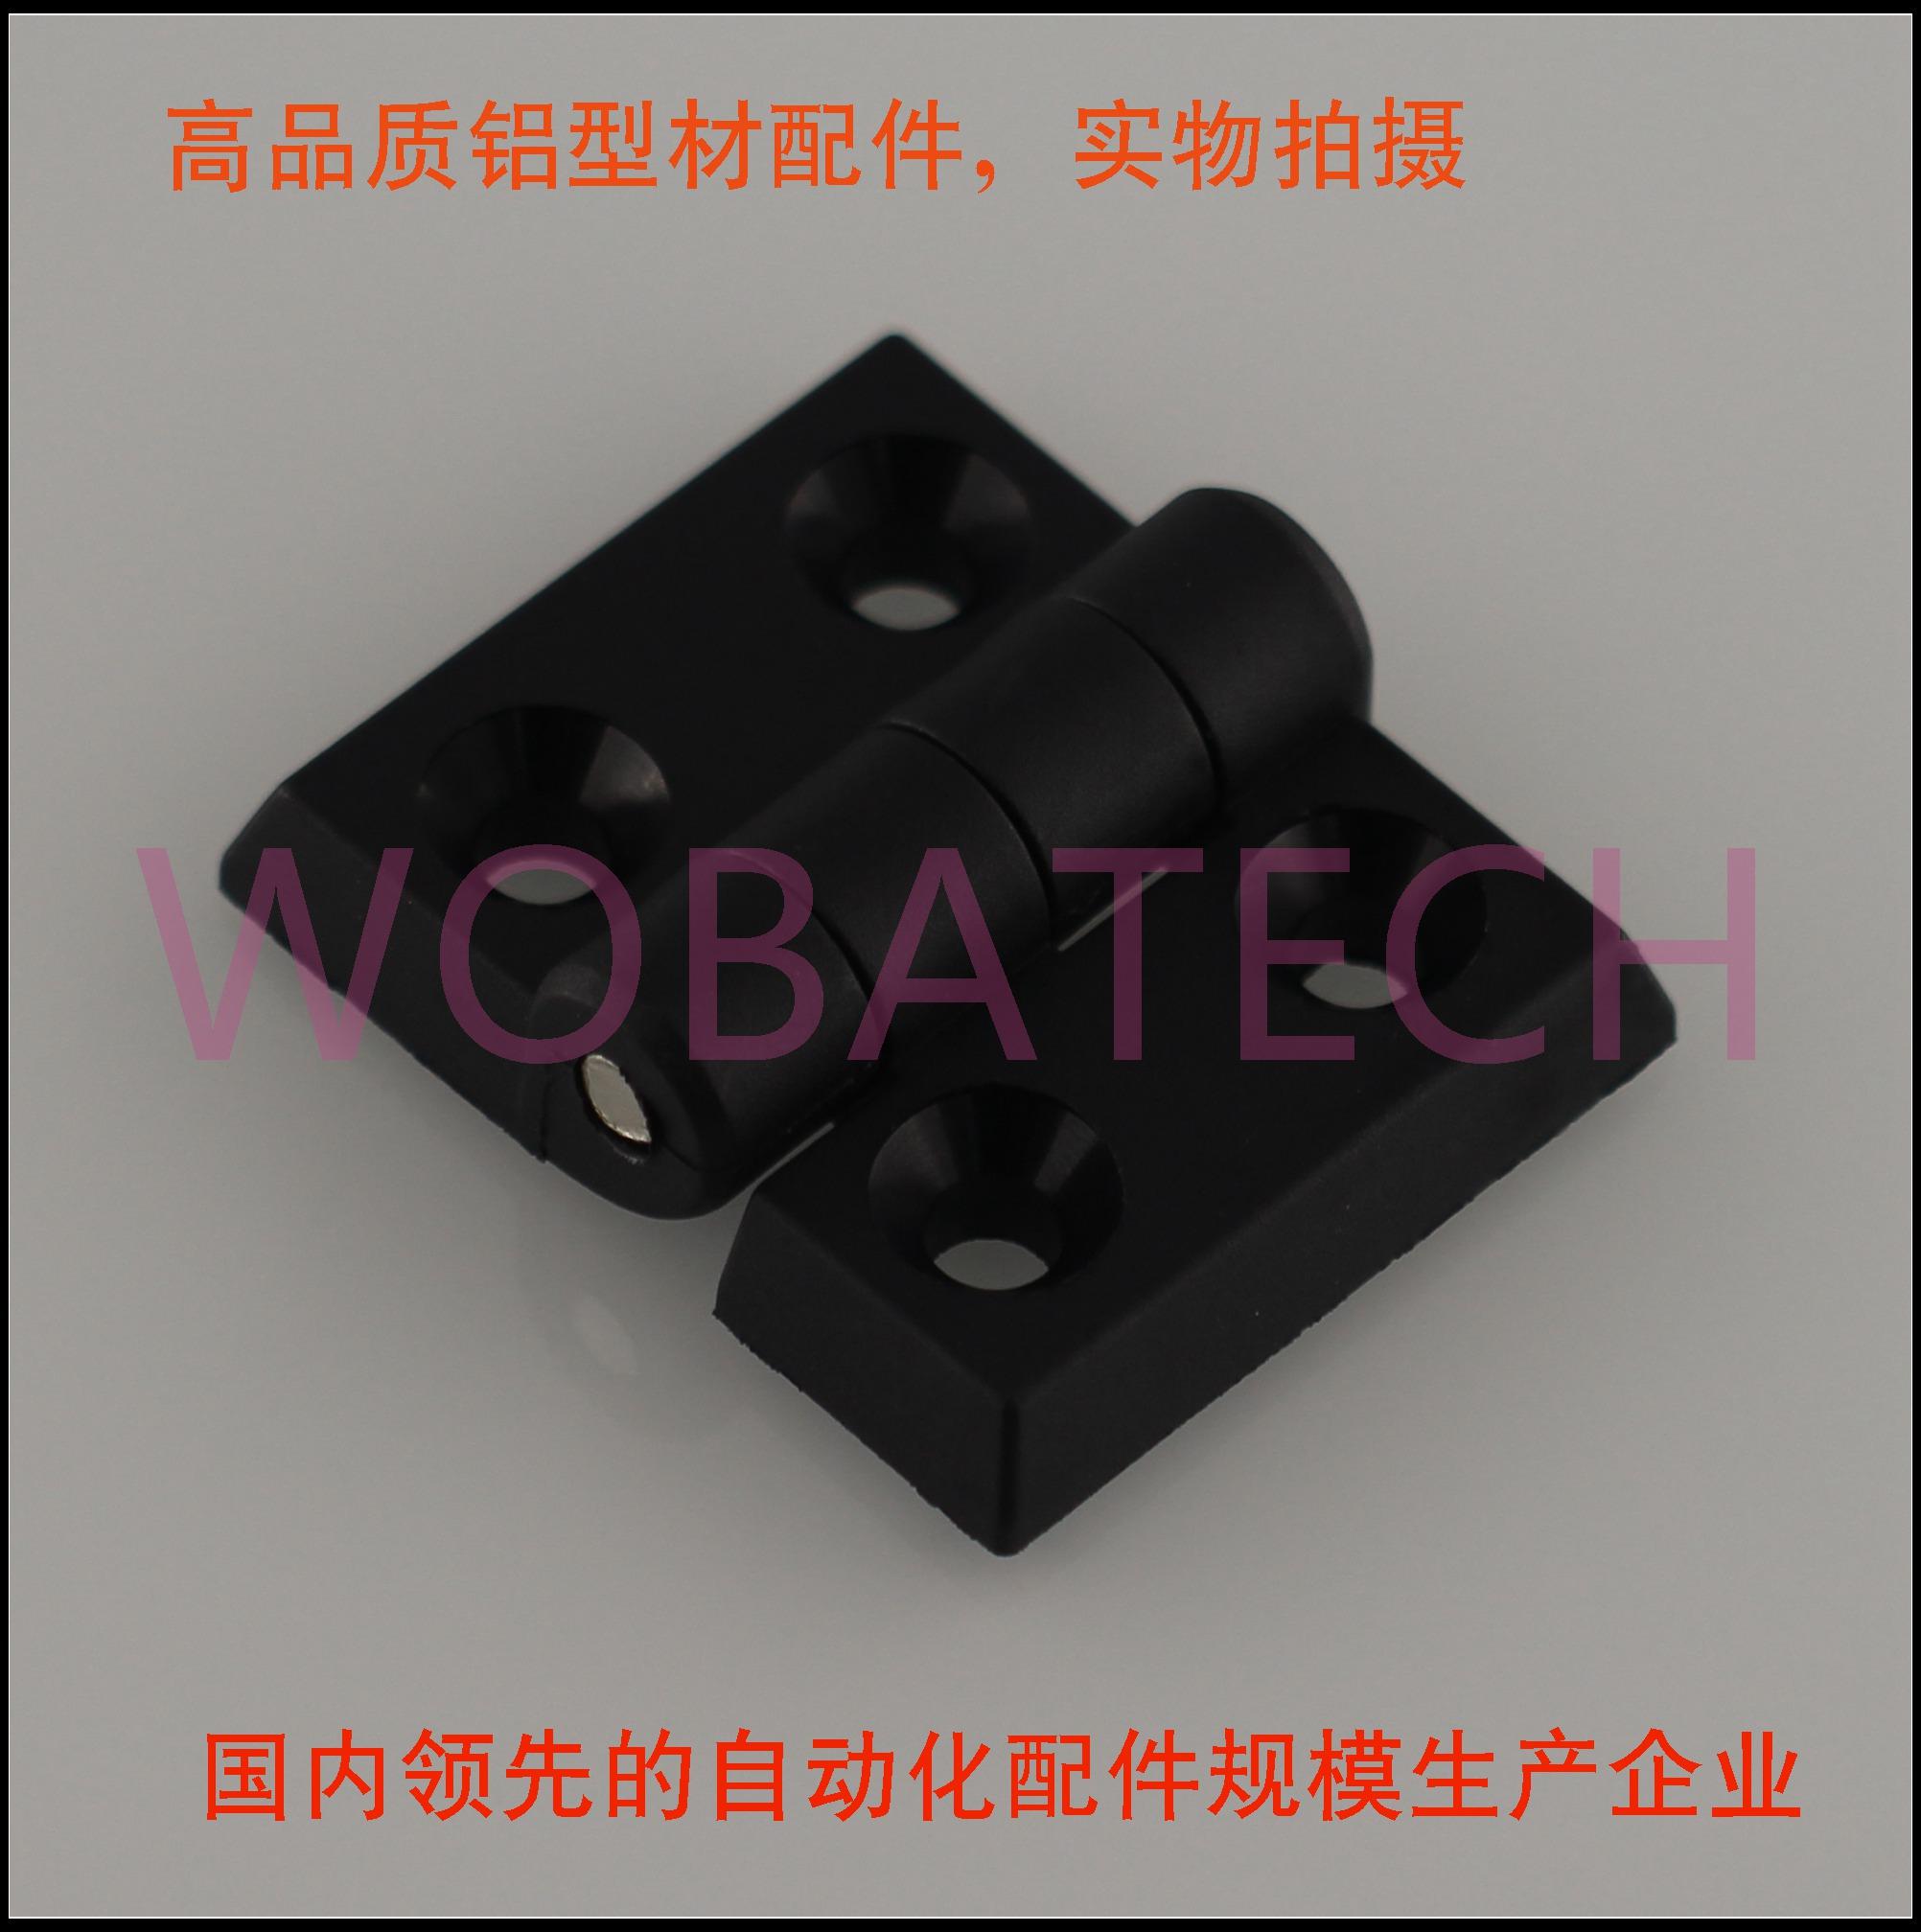 3030 groove 8 série de acessórios de alumínio reforçado nylon material plástico dobradiça removível 30Hinge-V